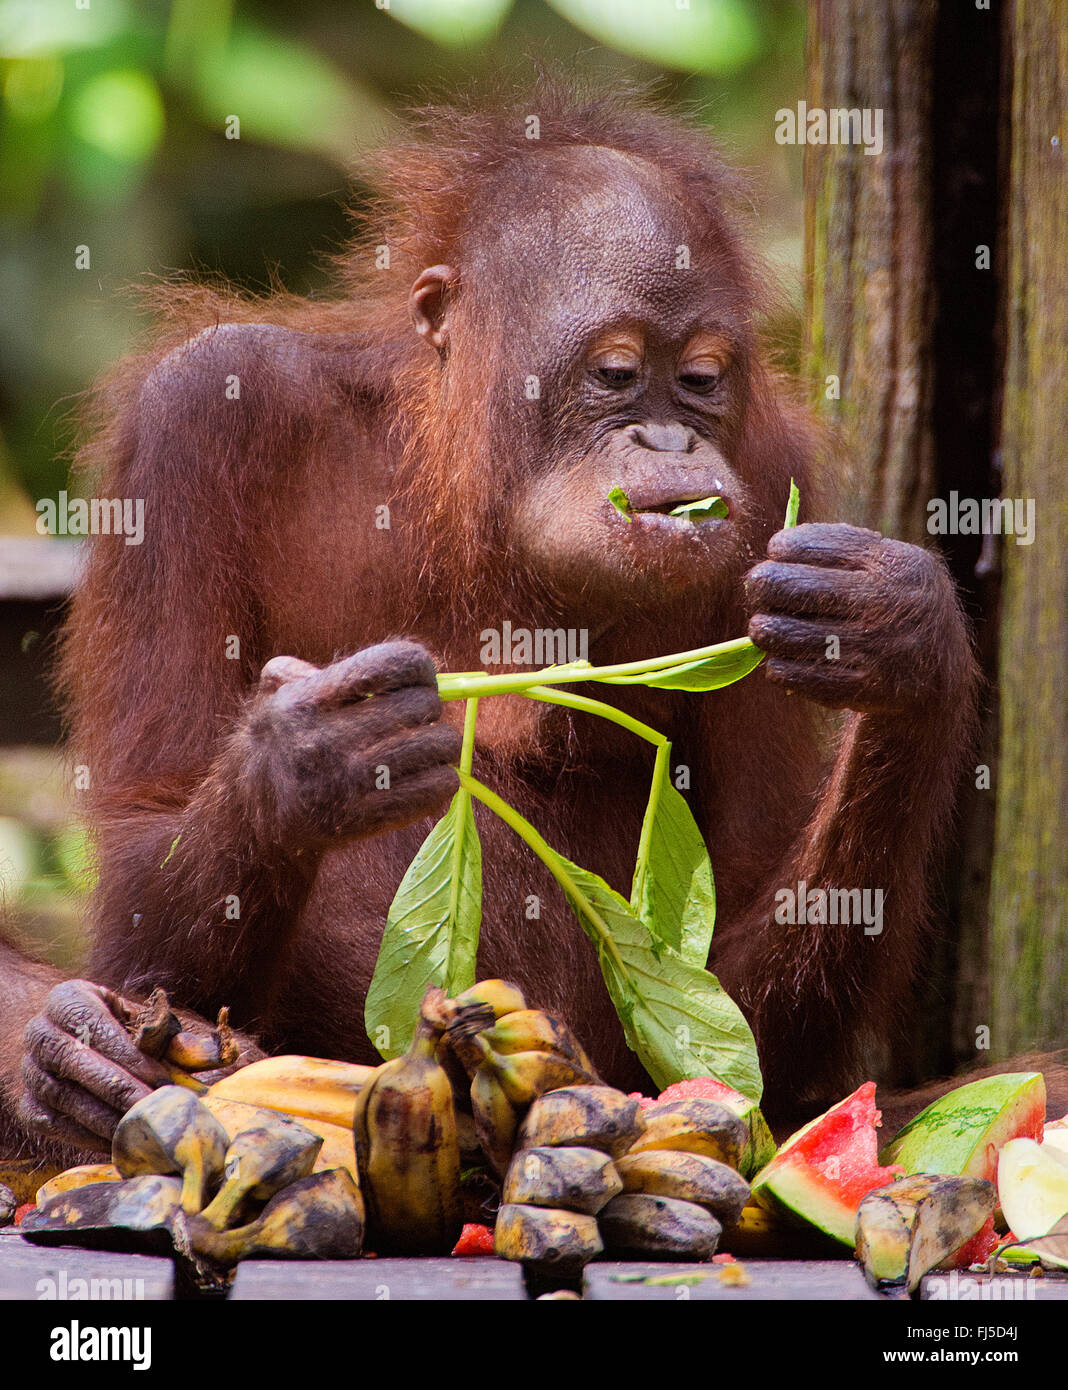 Northeast Bornean orangutan (Pongo pygmaeus morio), Juvenile orangutan feeding , Malaysia, Borneo, Sabah, Sepilok - Stock Image